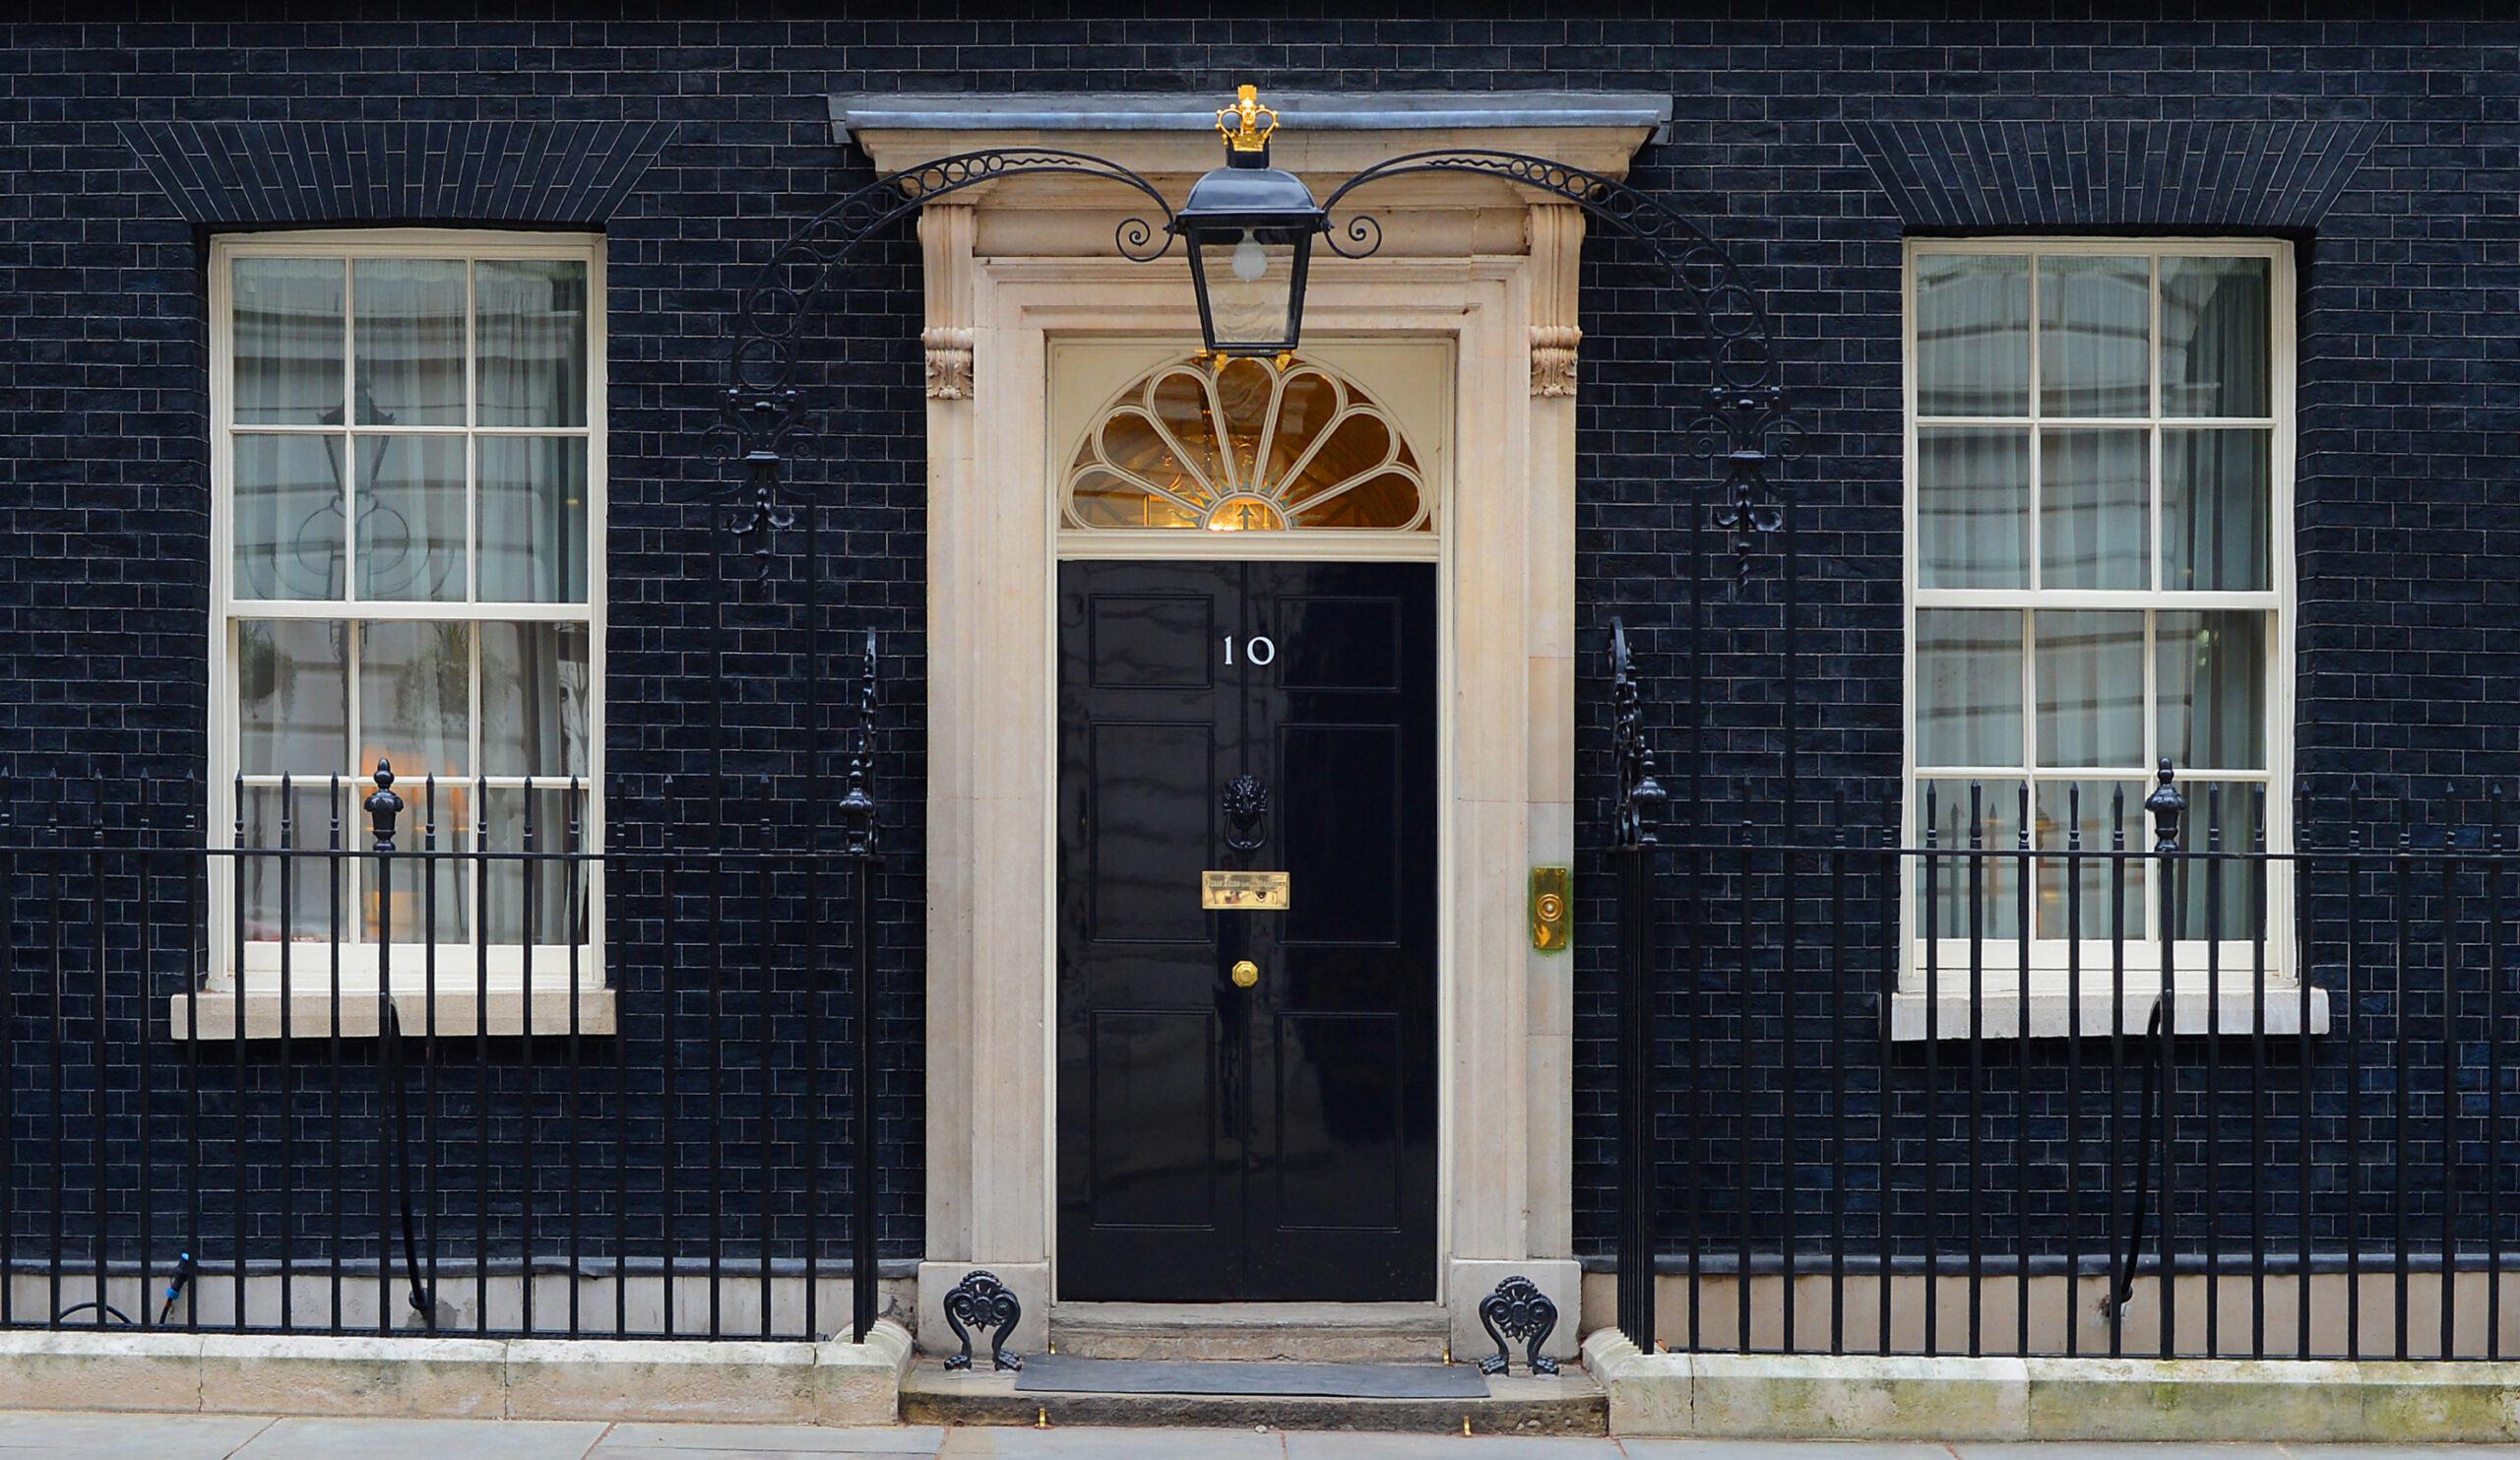 Labour, Lib Dem & Conservative manifesto pledges for housing/getting on the property ladder.